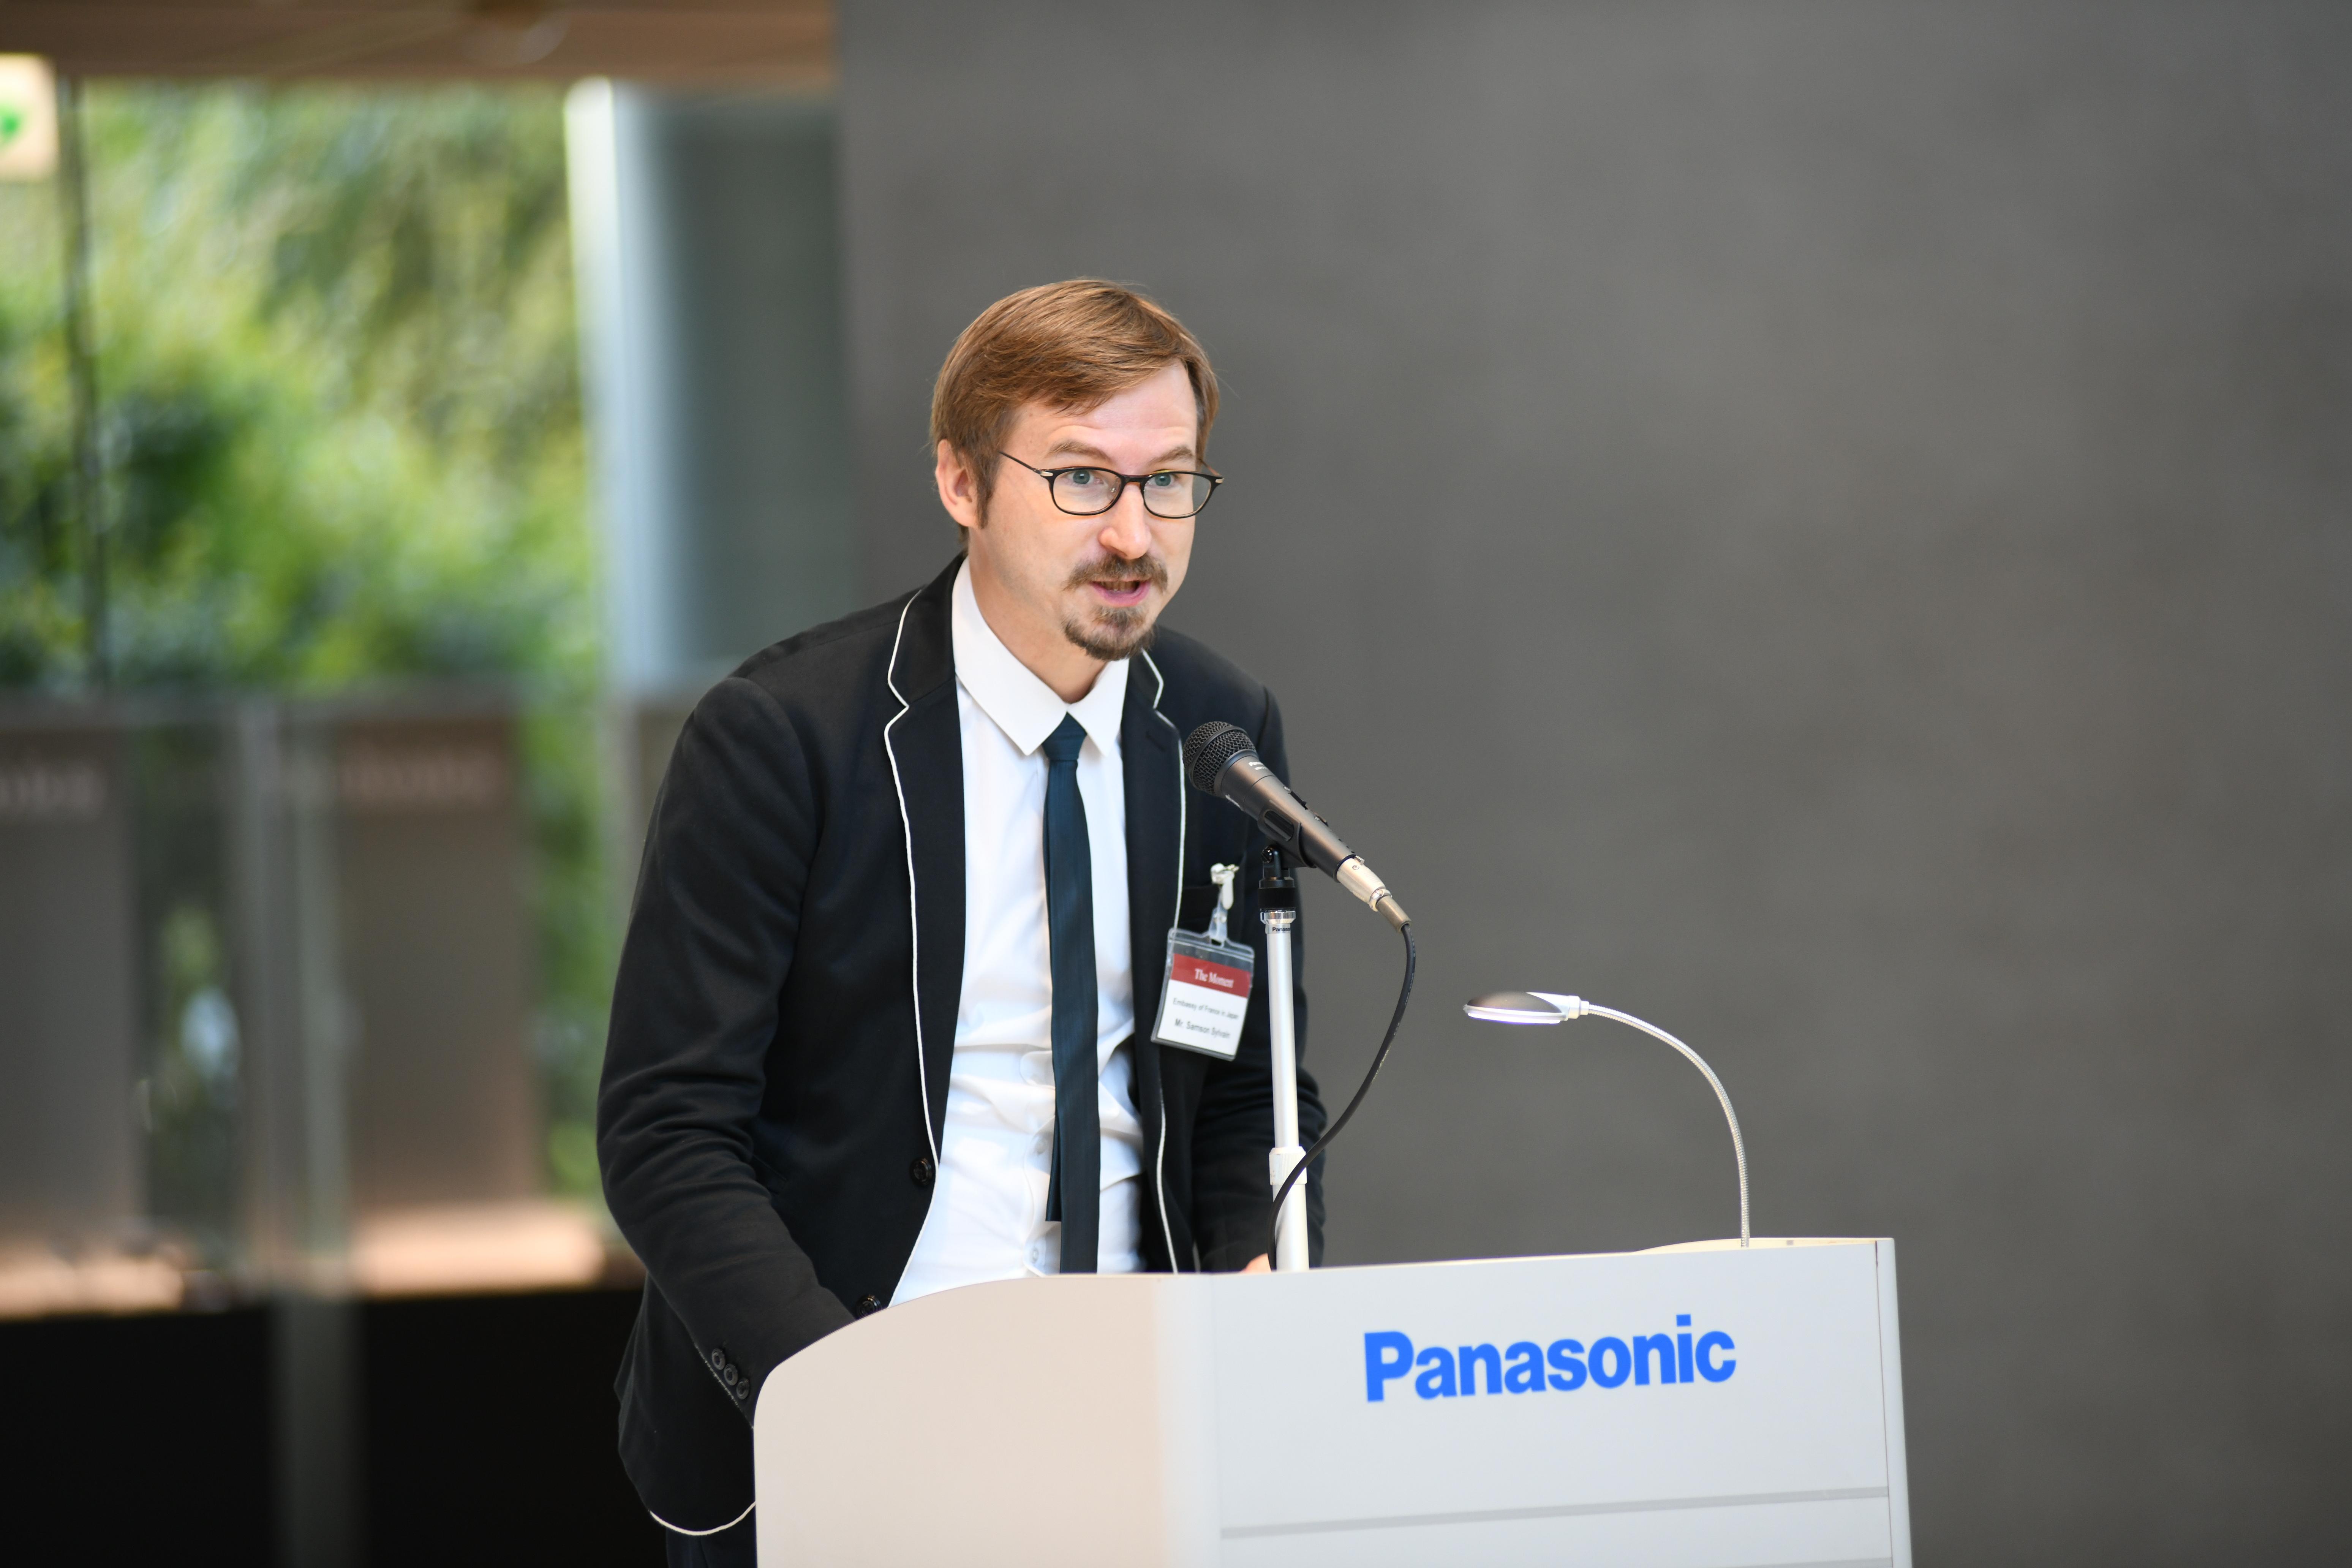 photo: Mr. Samson Sylvain, Cultural Attache, Embassy of France in Japan